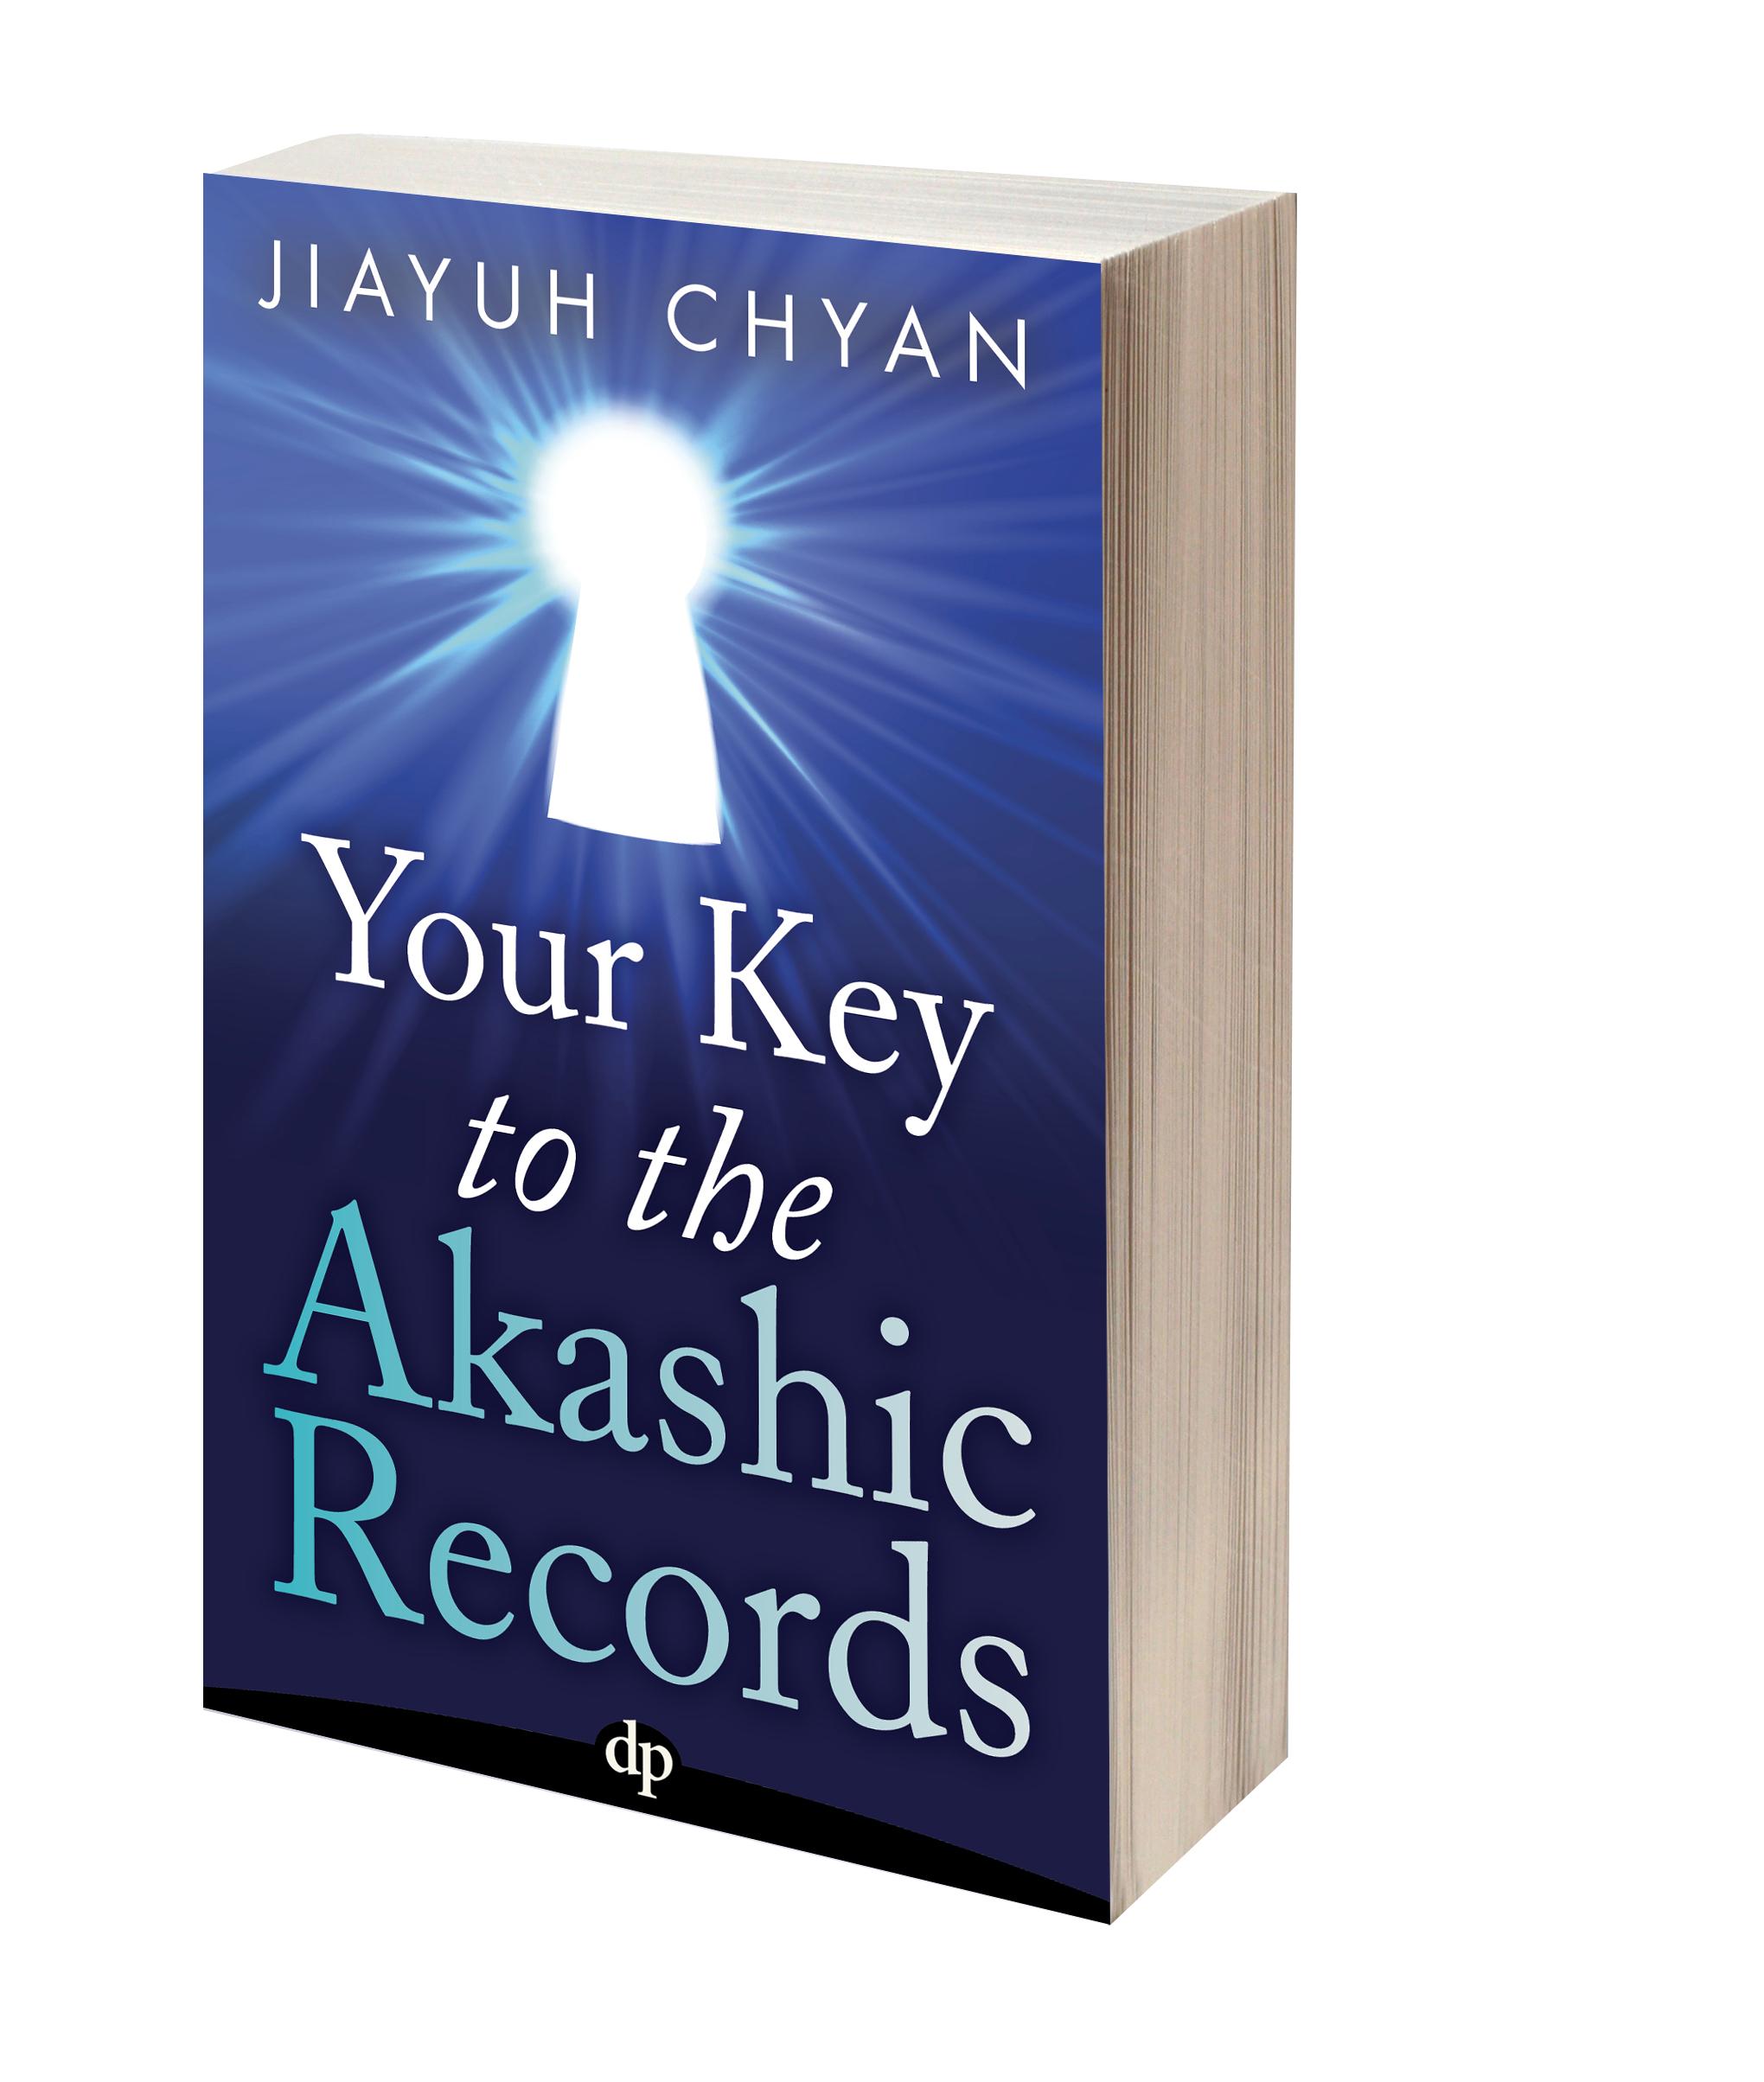 Chyan_KeyAkashicRecords_3DBook.jpg